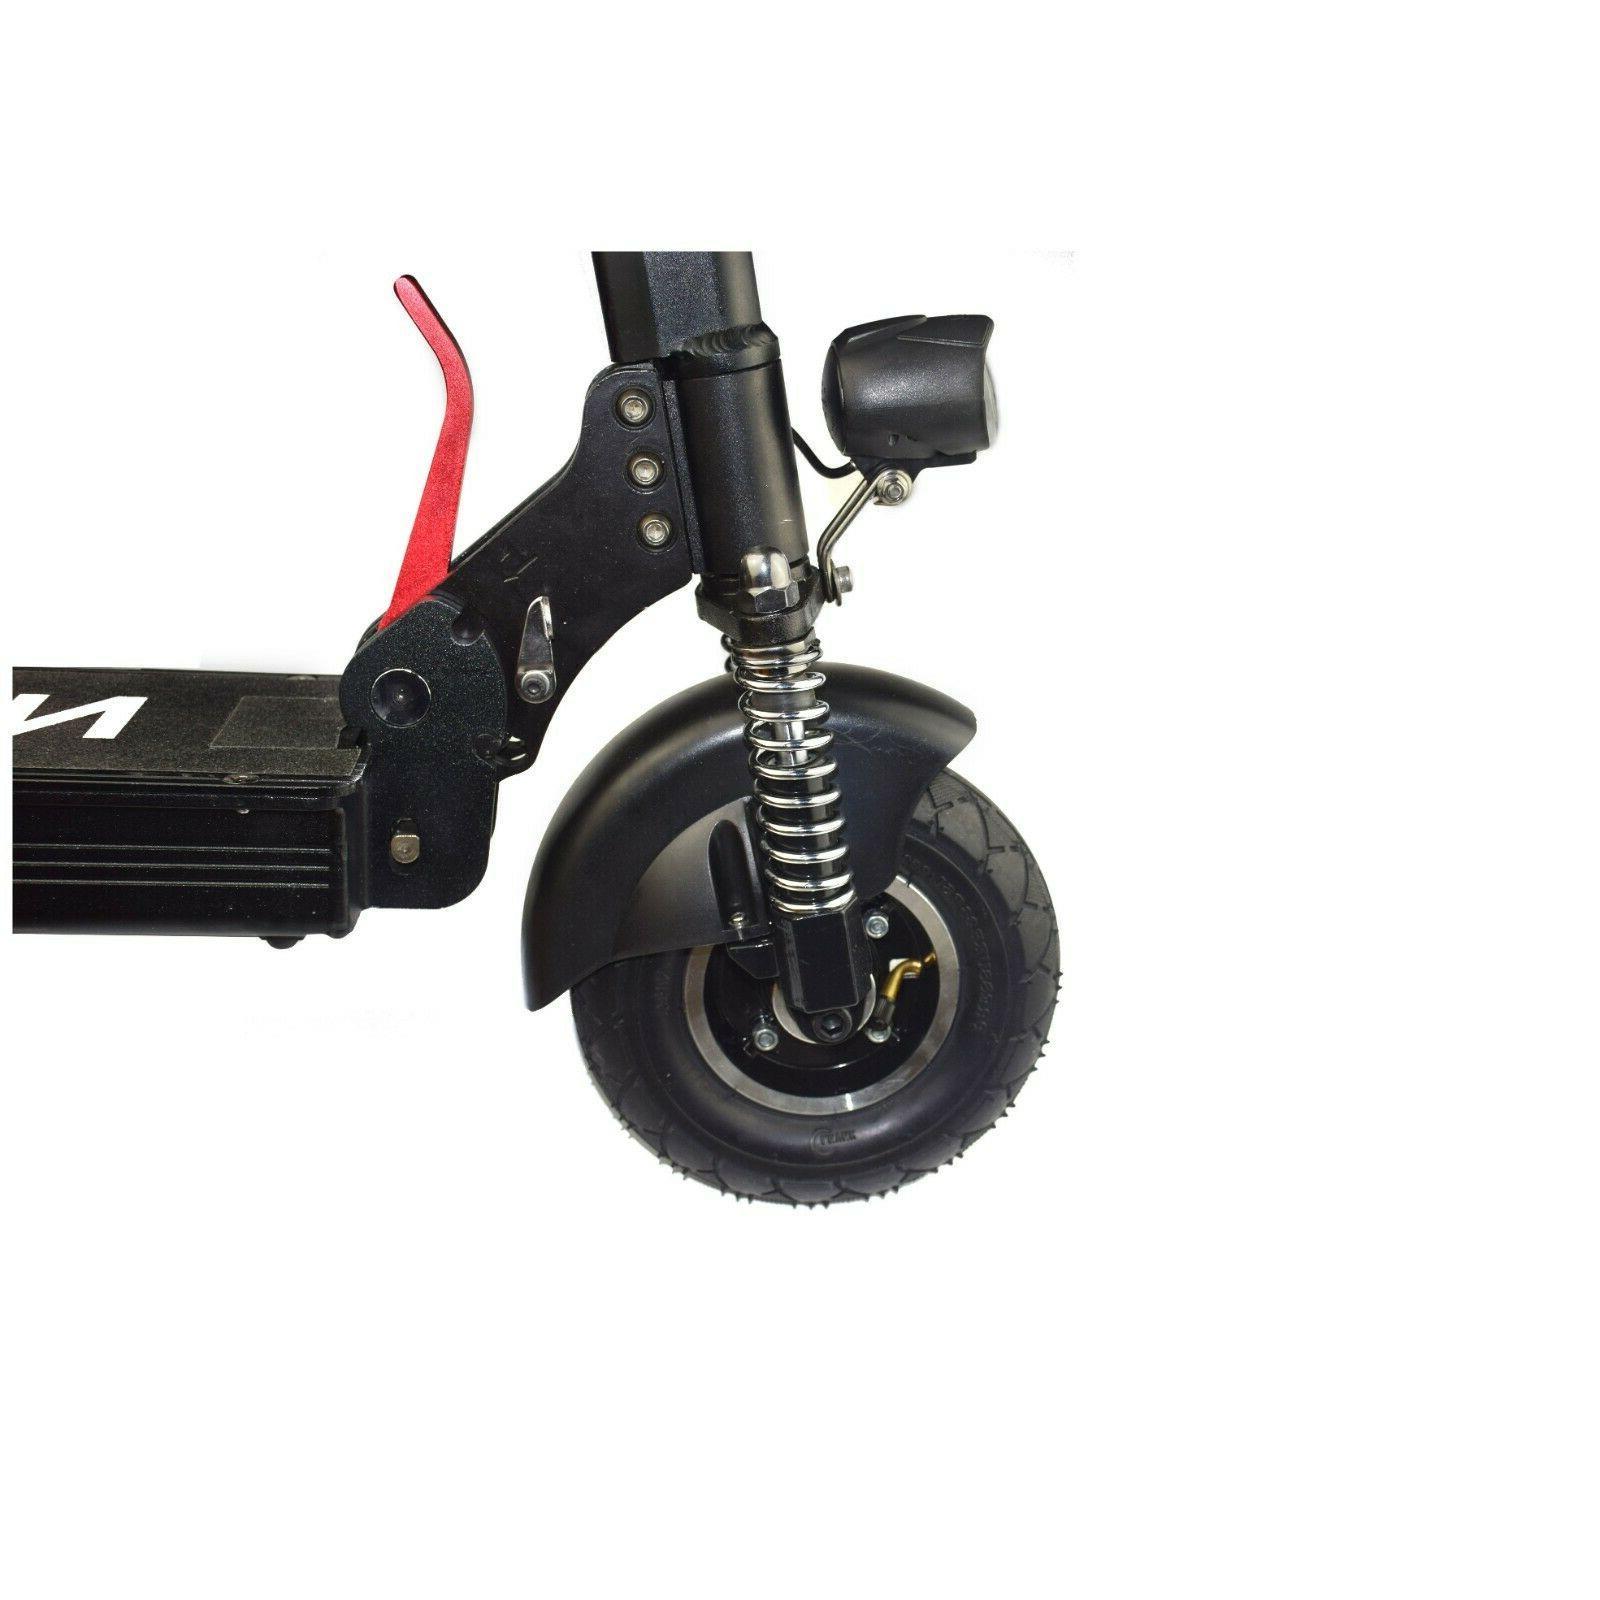 "NANROBOT Scooter 500W Motor Power 48V 8"" Tires MPH SHIP"